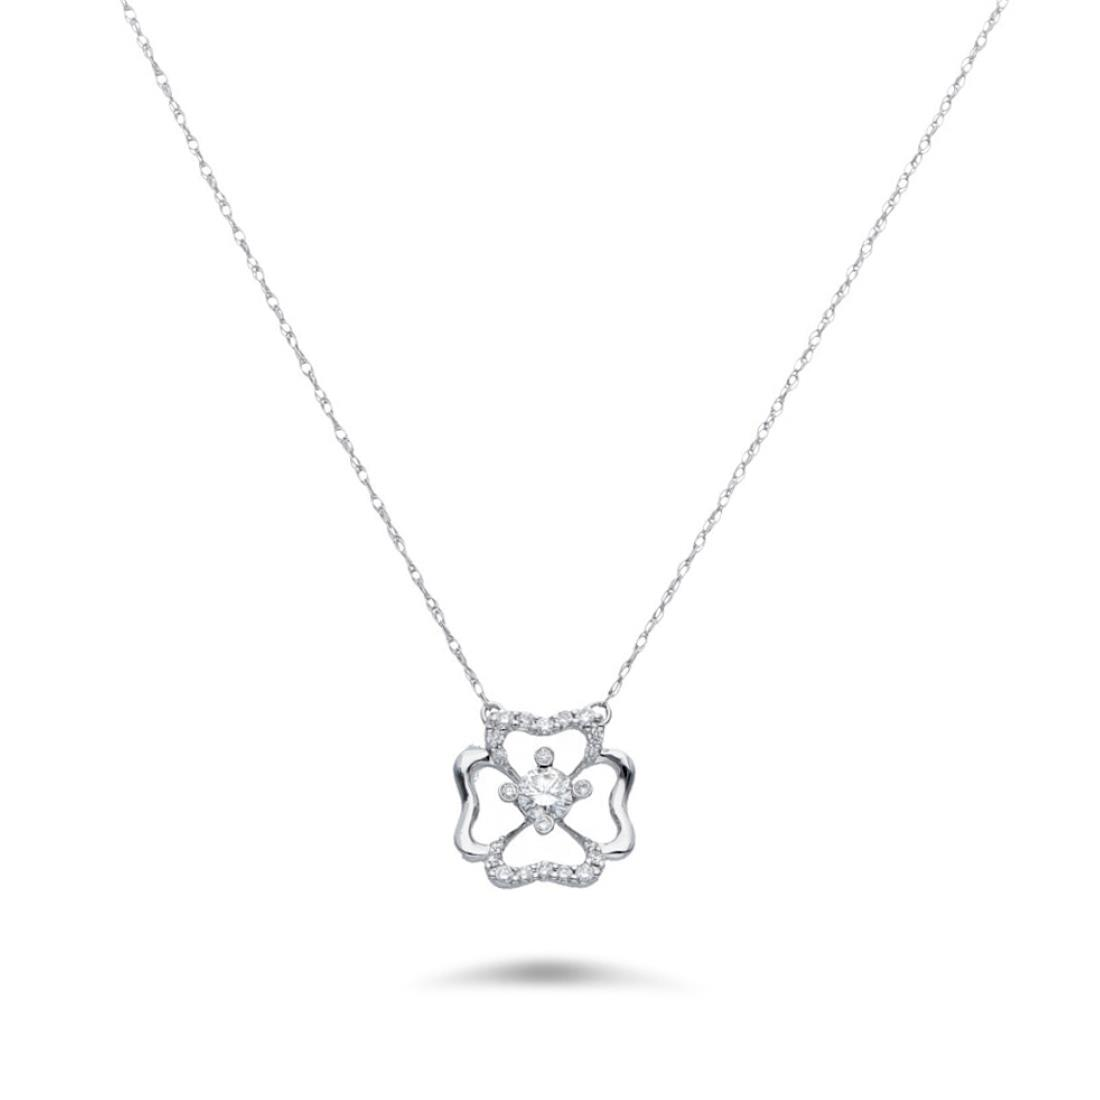 Collana con diamanti - BLISS